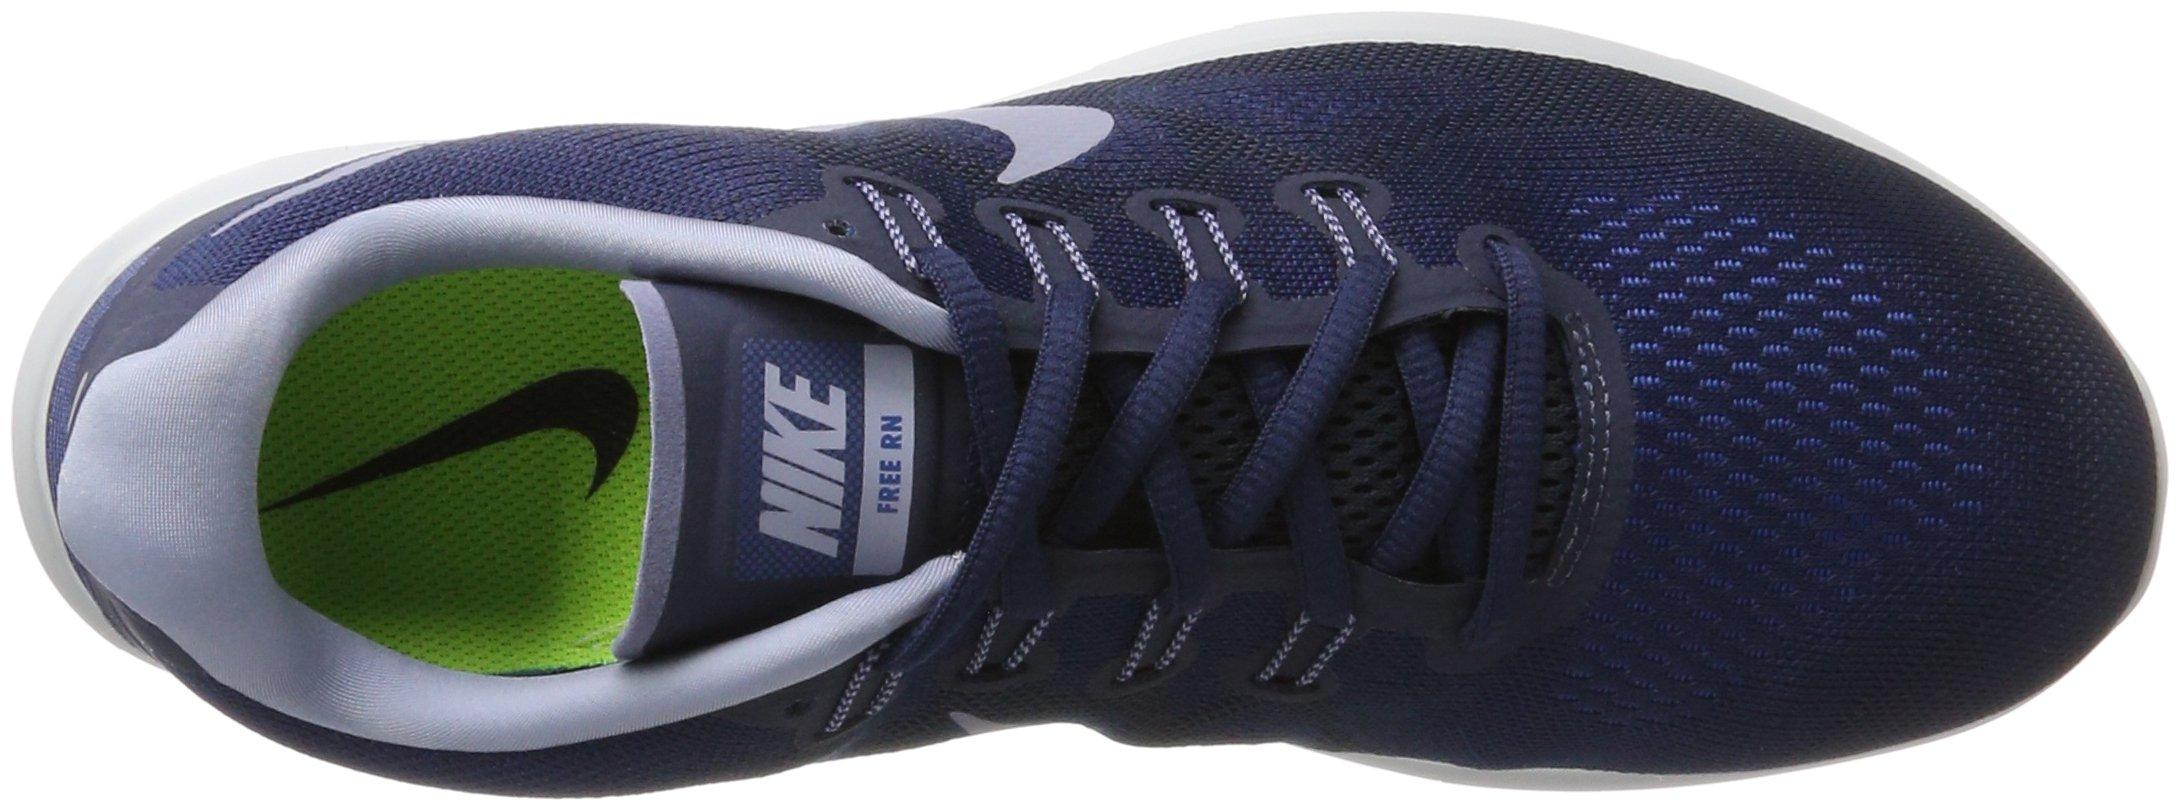 Nike ''Free RN'' 2017 Binary Blue/Dark Sky Blue 8 by Nike (Image #7)